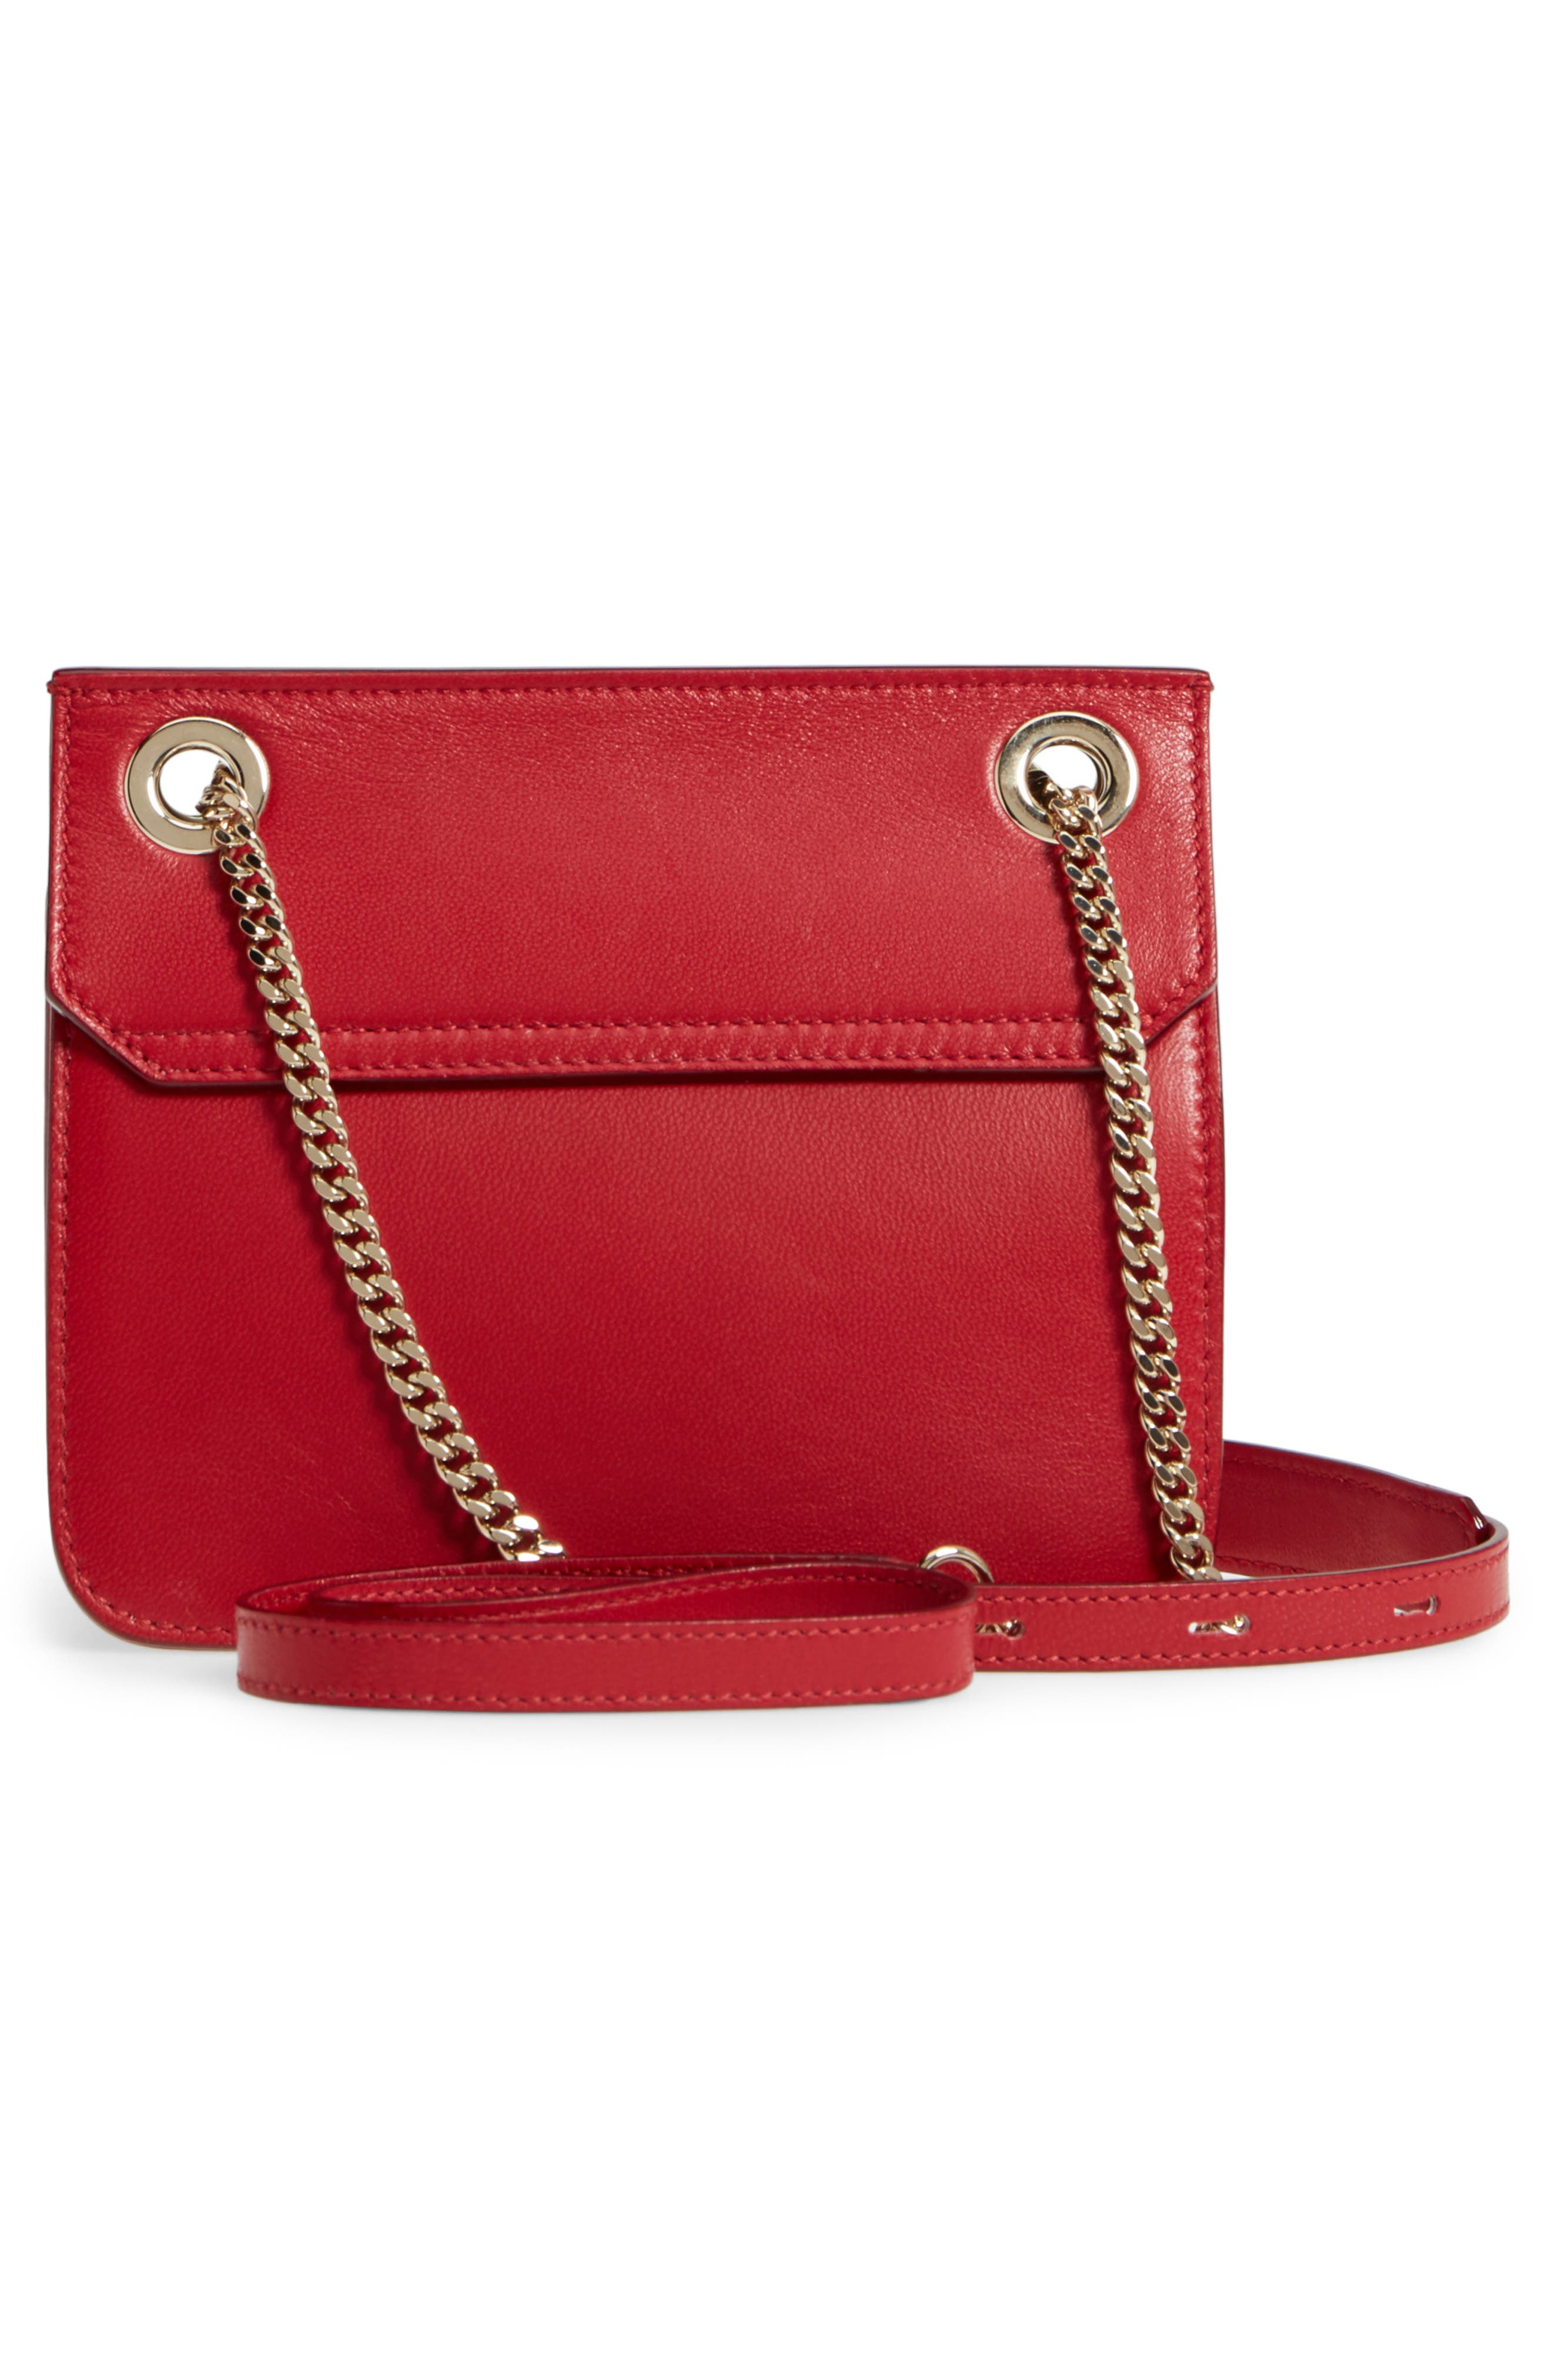 Rebel Mini Colorblock Leather Crossbody Bag,                             Alternate thumbnail 3, color,                             Red/ Rosewater